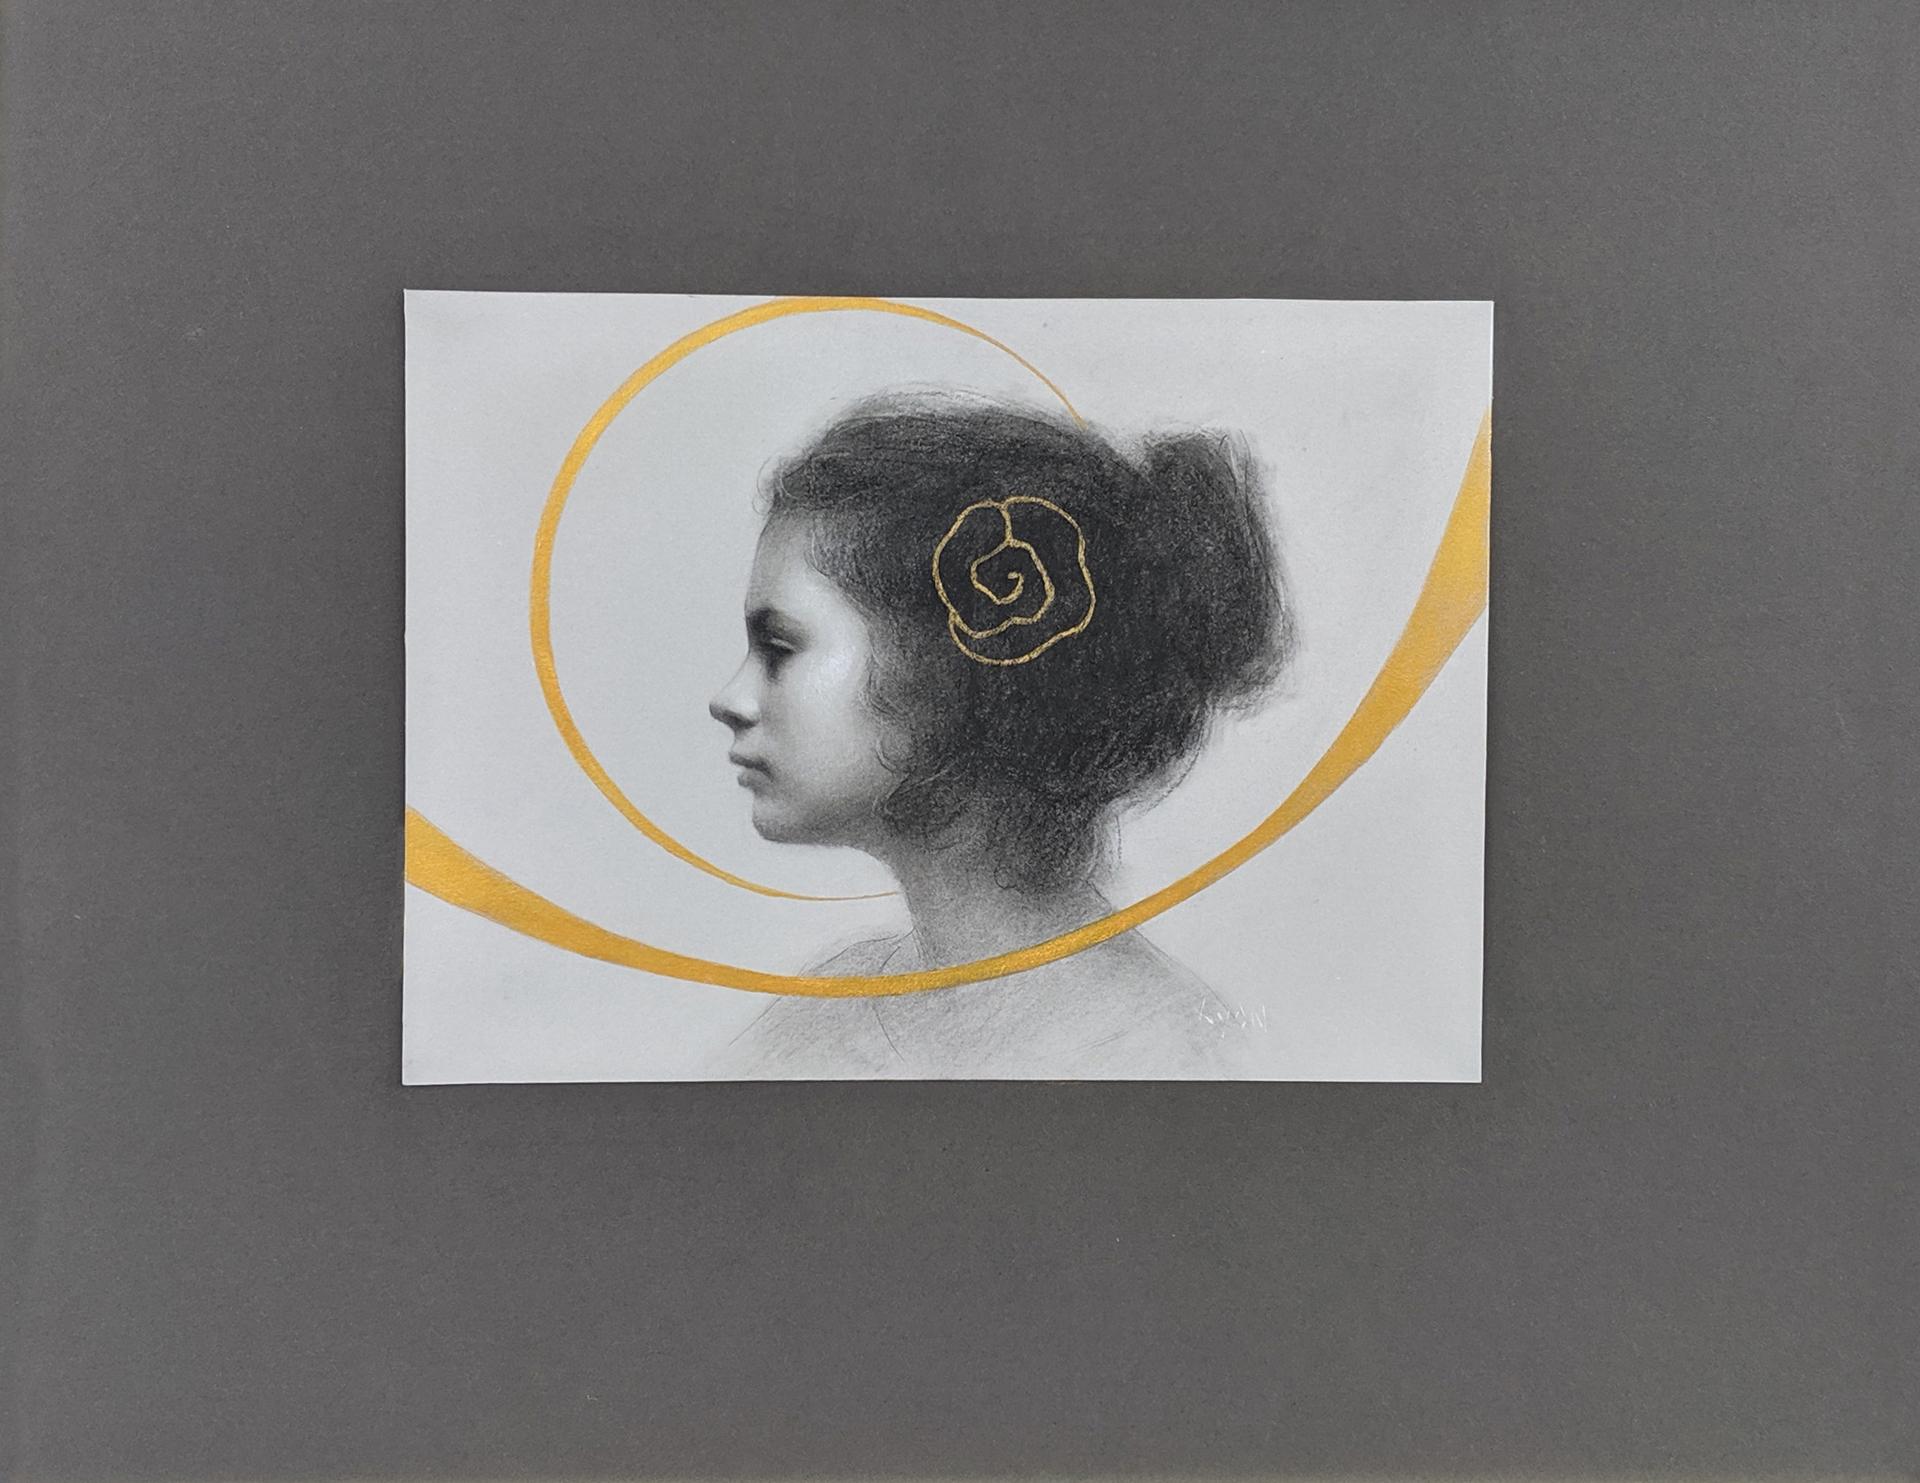 Golden Rose by Susan Lyon